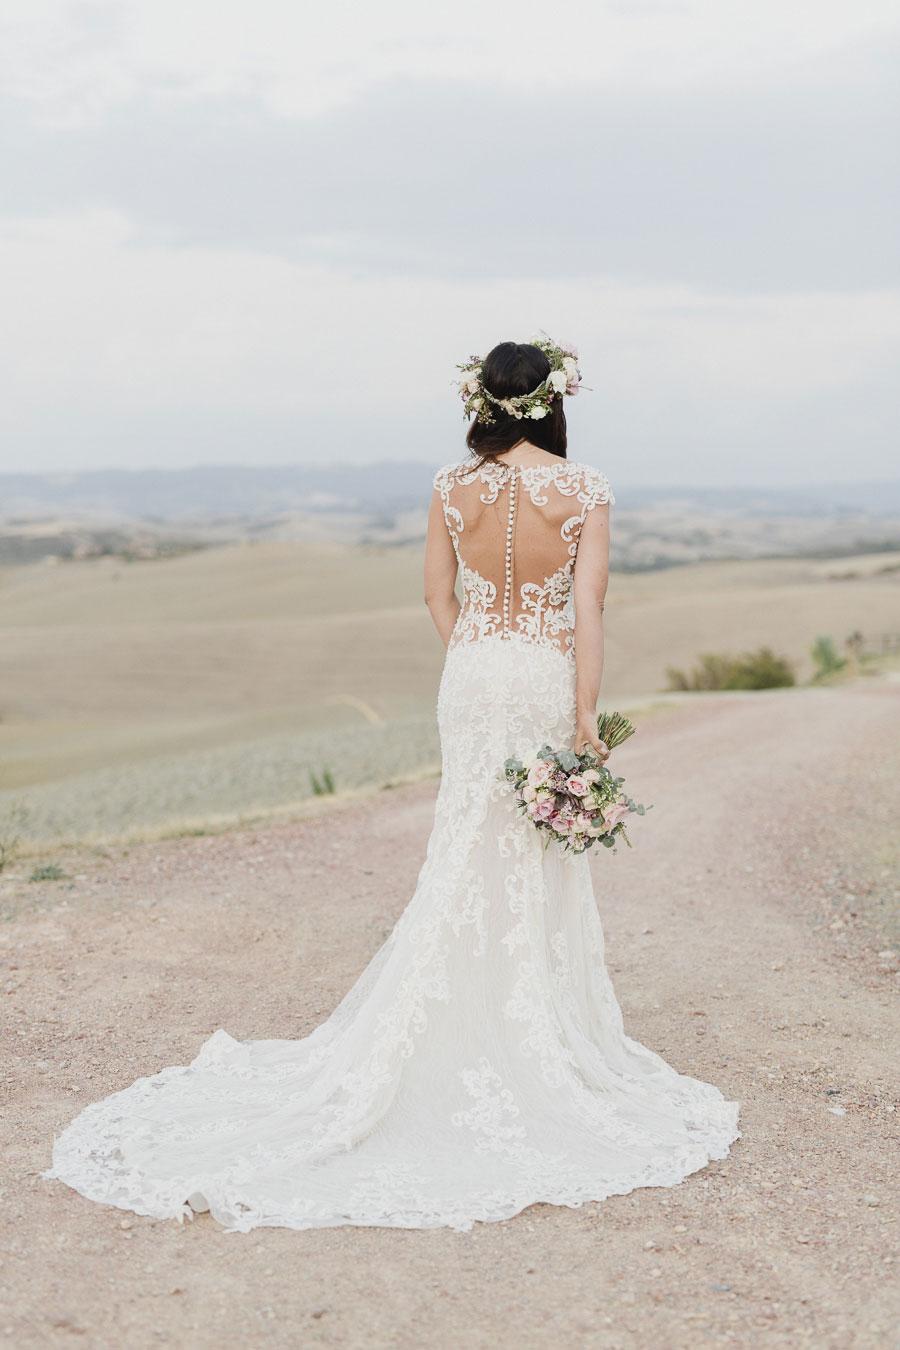 Wedding-Nicholad-and-Federica-Giuseppe-Giovannelli-161